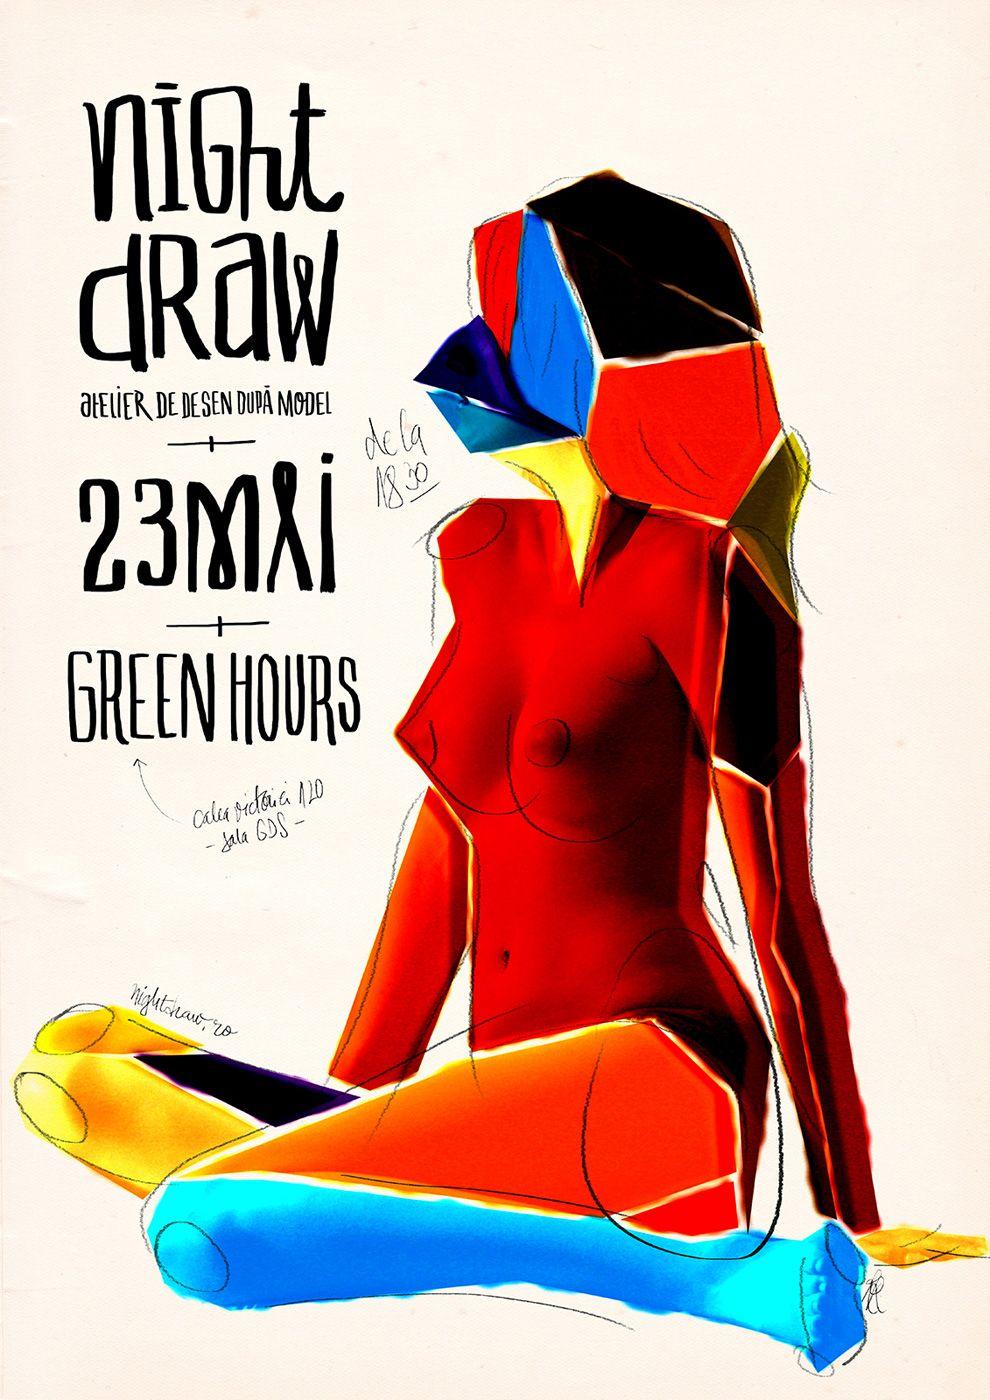 Andrei Ogradă - typo/graphic posters   graphic Design ...